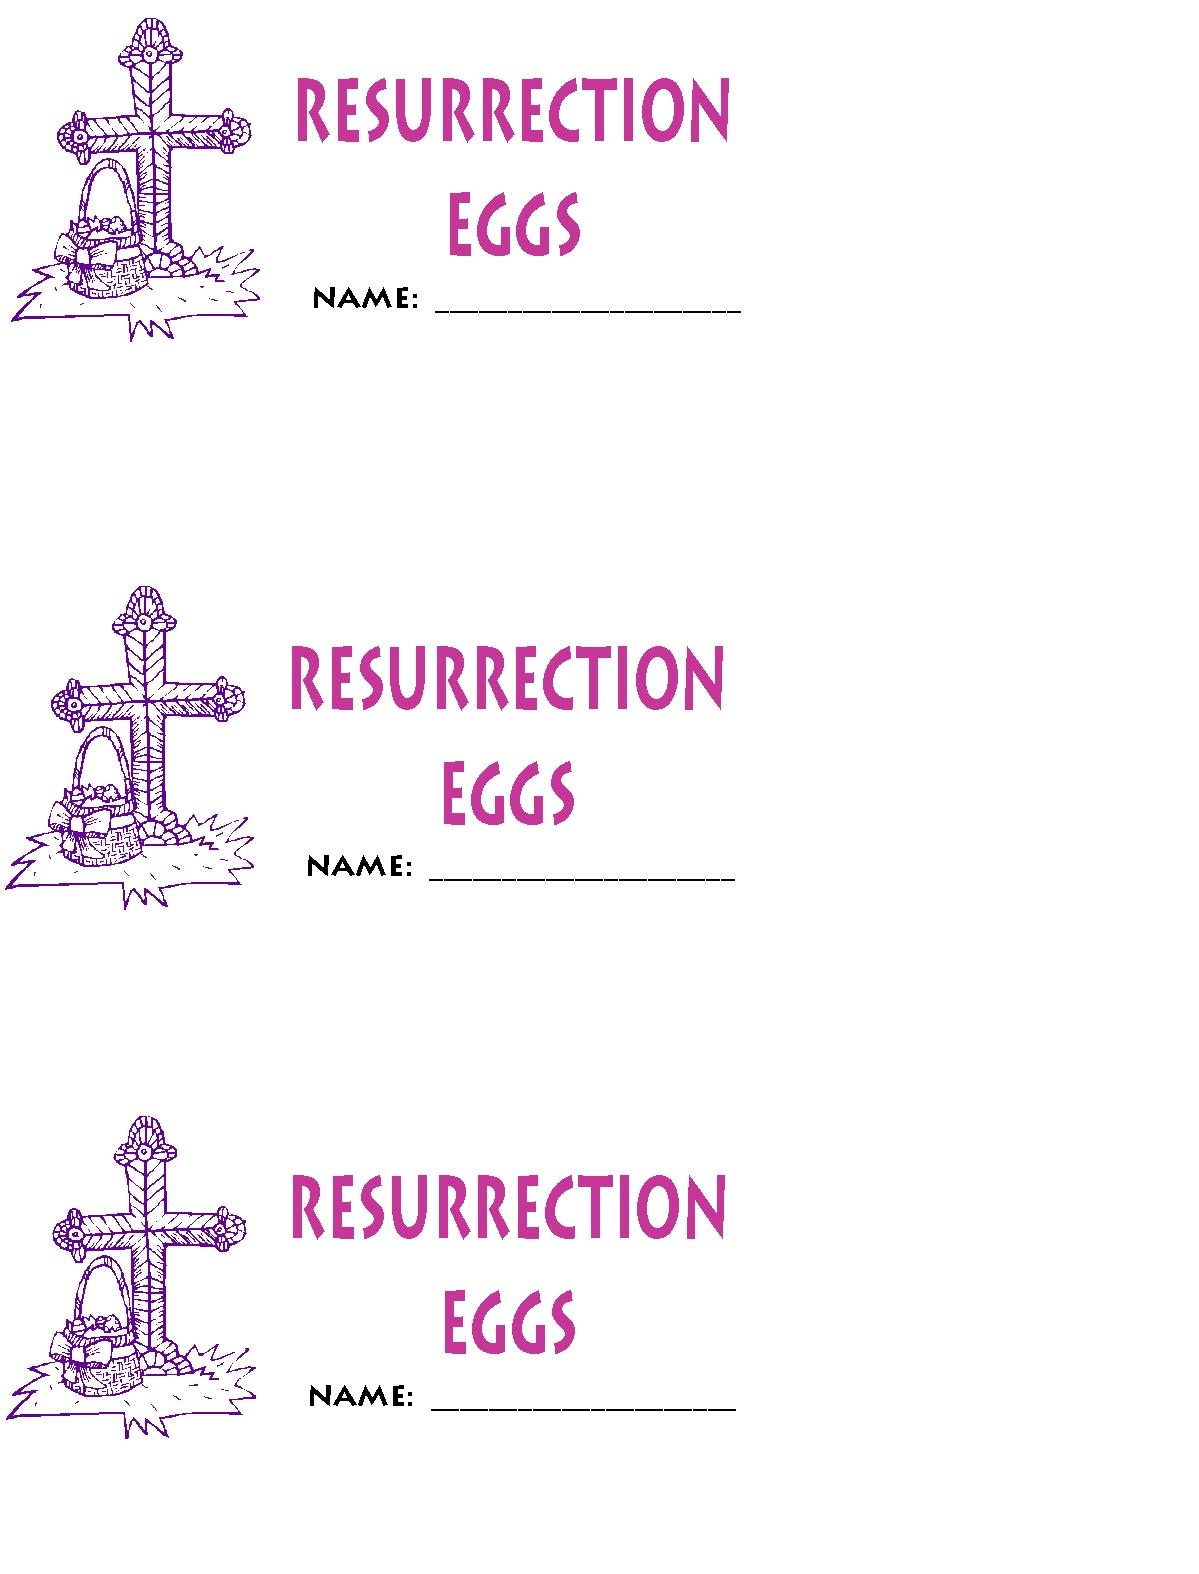 Homemade Resurrection Eggs Free Printables Kathy Hutto